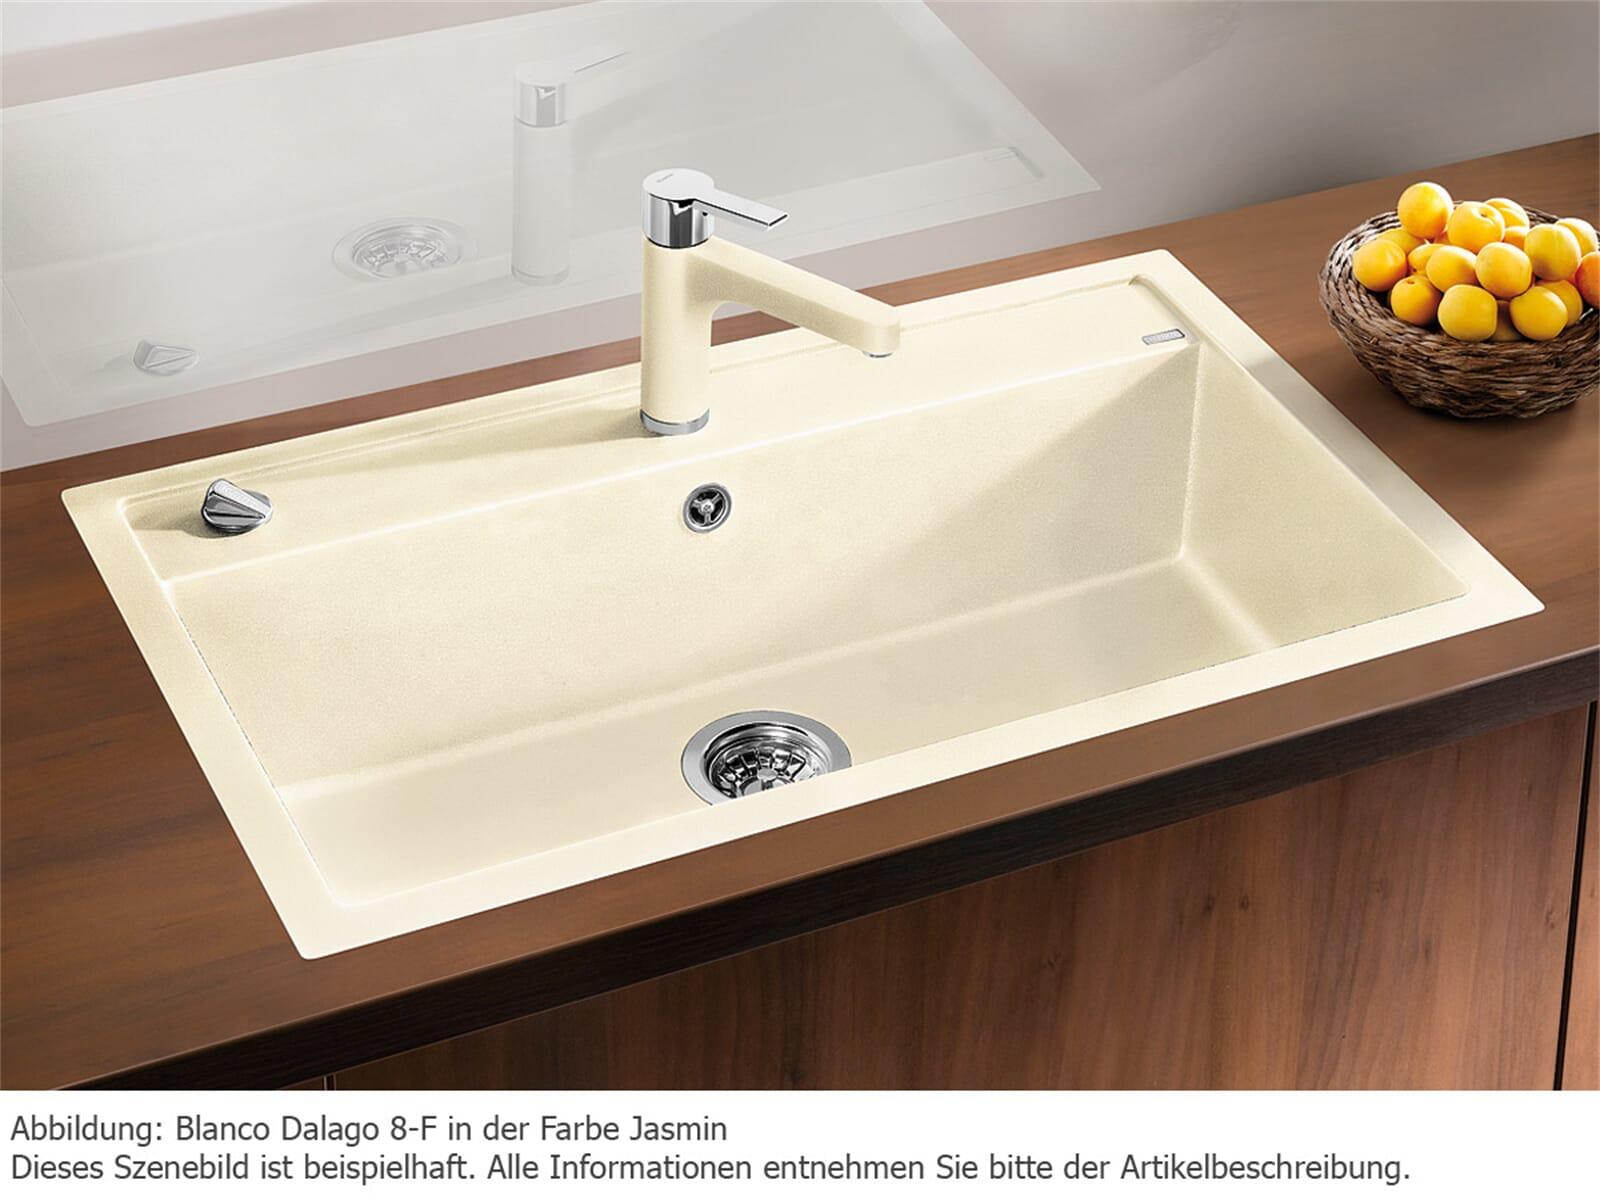 blanco dalago 8 f wei granit sp le fl chenb ndig granit k chensp le sp lbecken ebay. Black Bedroom Furniture Sets. Home Design Ideas